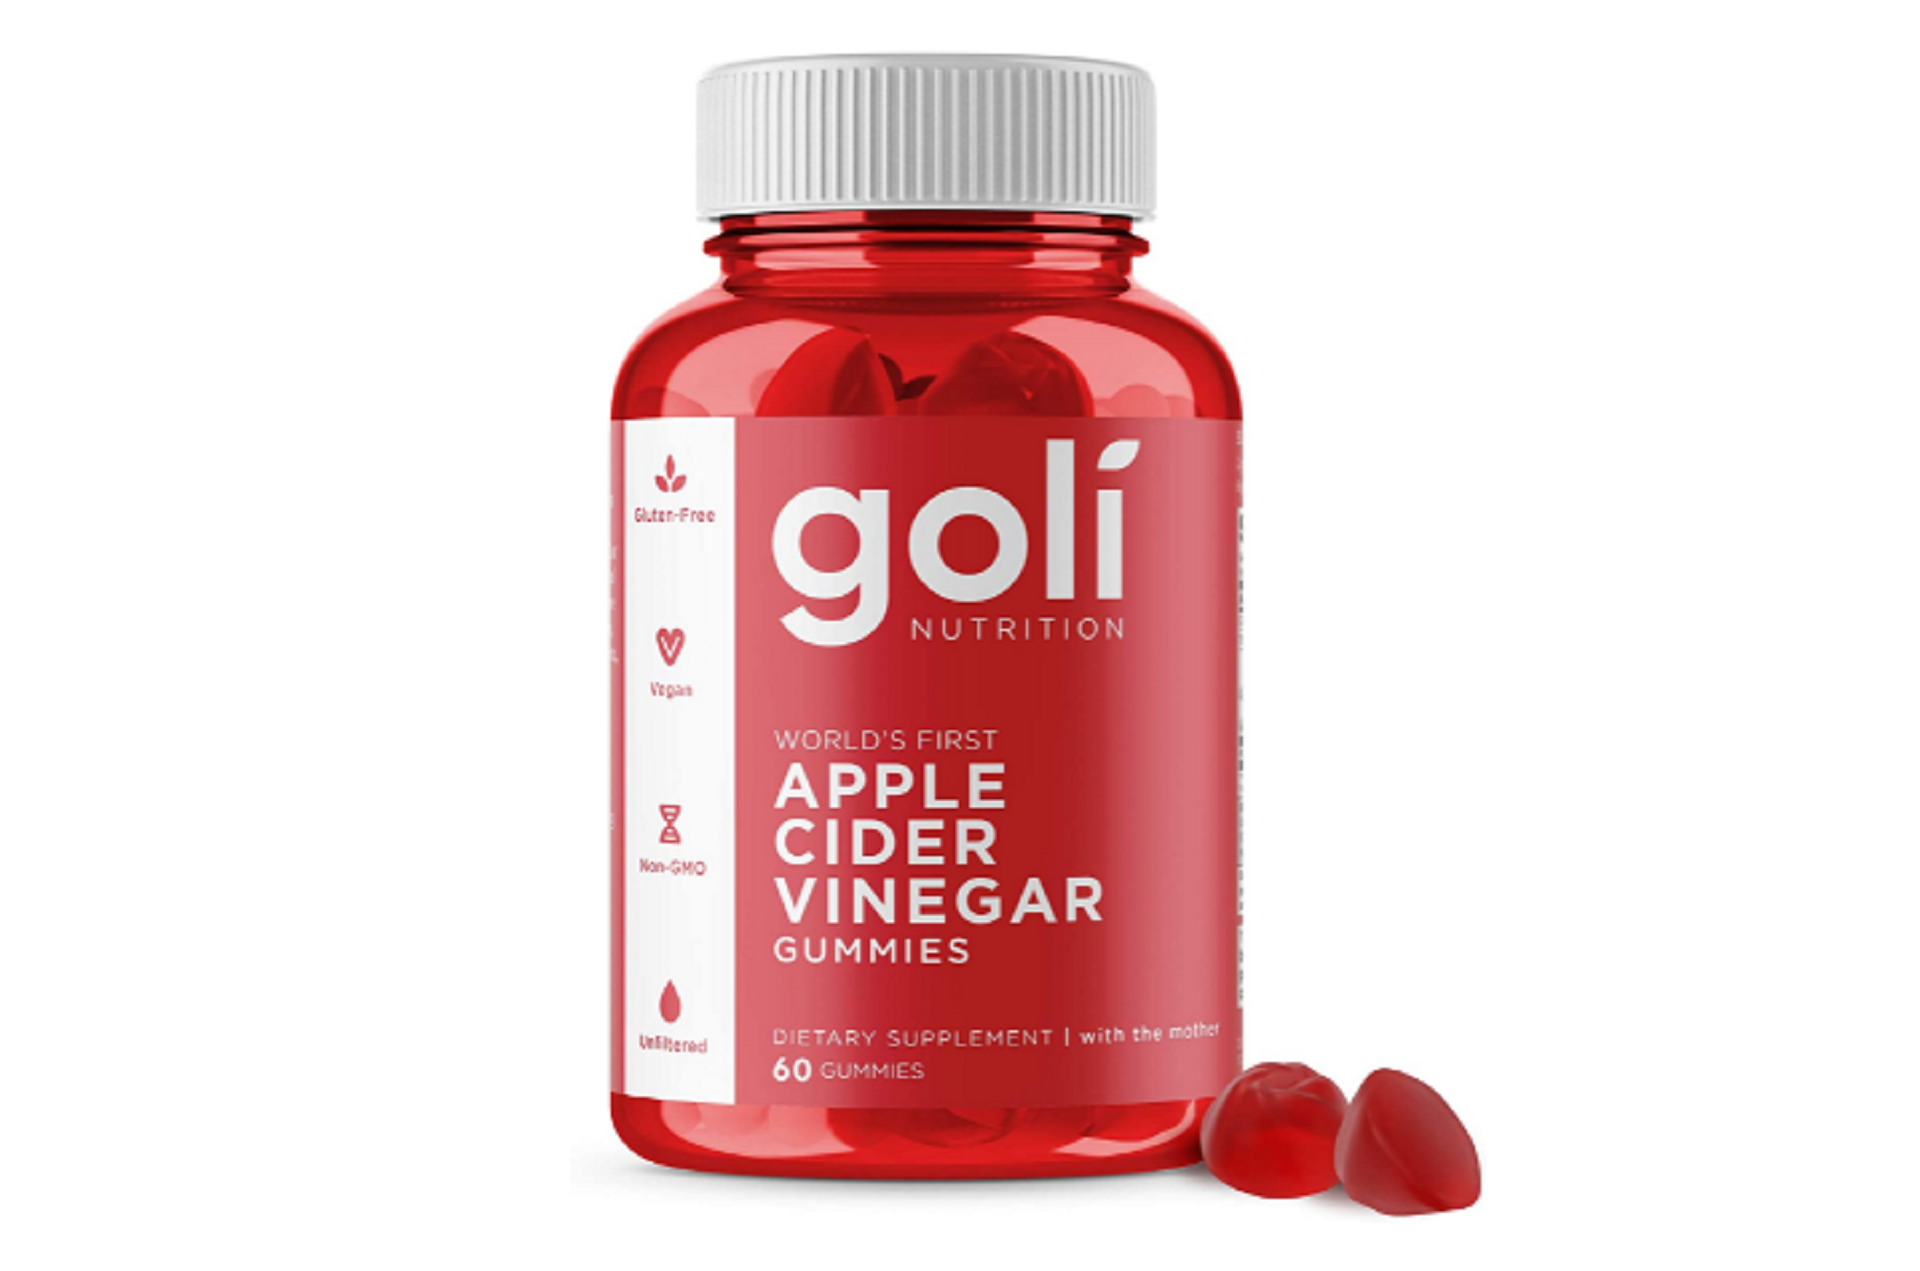 goli nutrition apple cider vinegar gummies